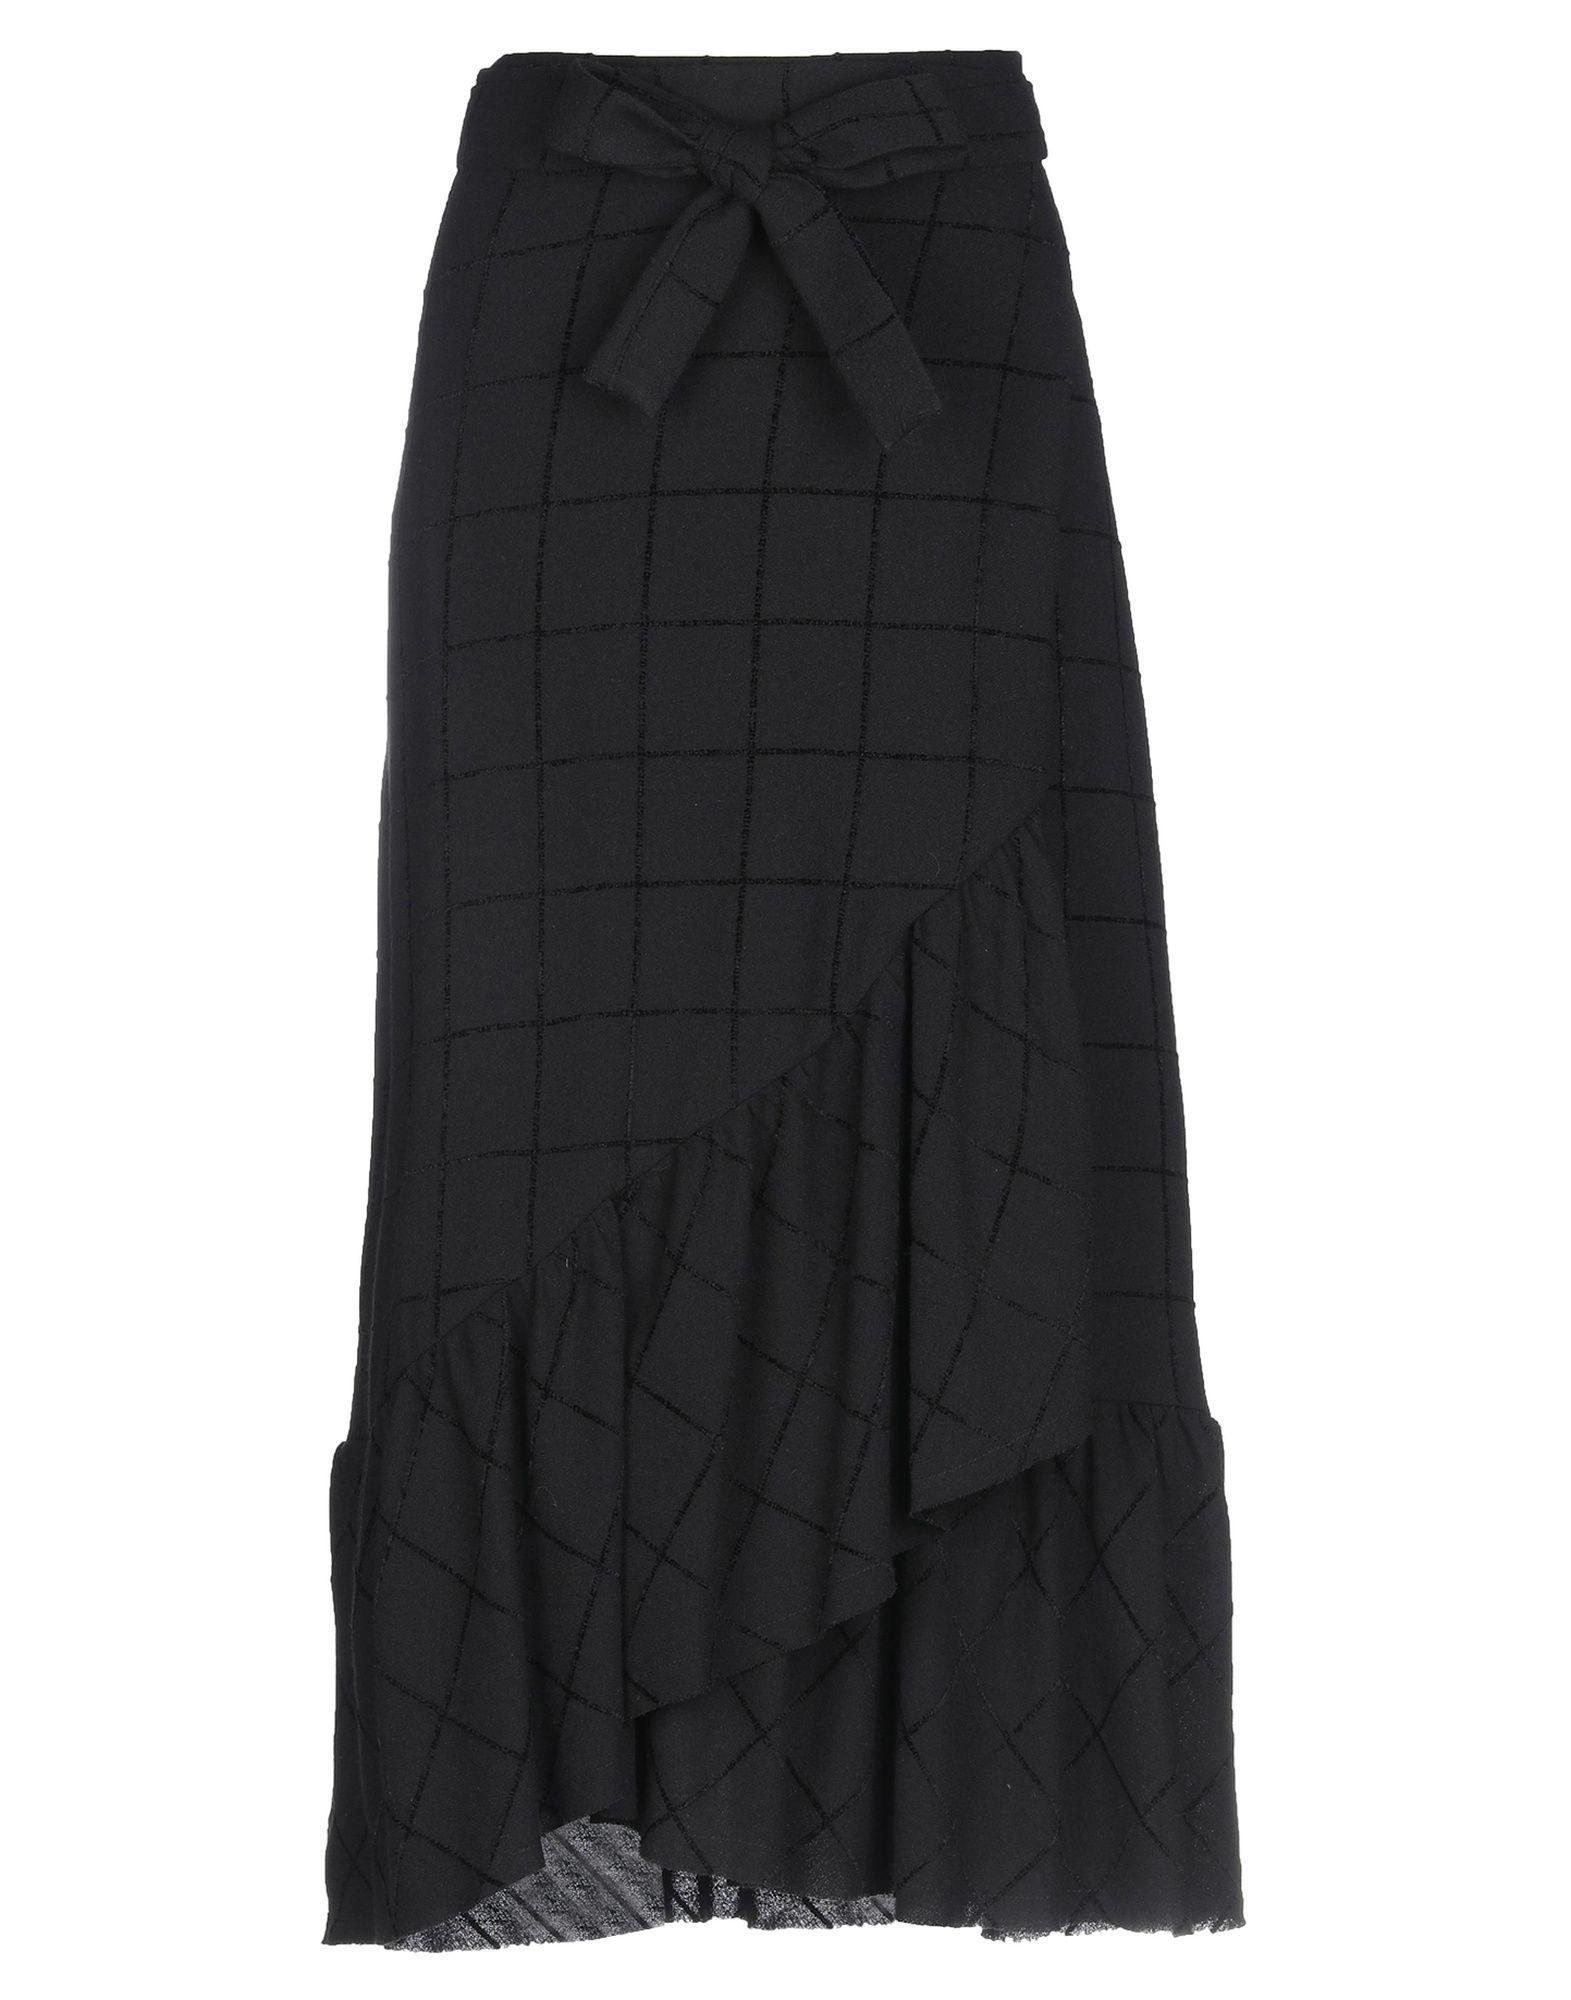 OTTOD'AME Юбка длиной 3/4 юбка с запахом на пуговицах